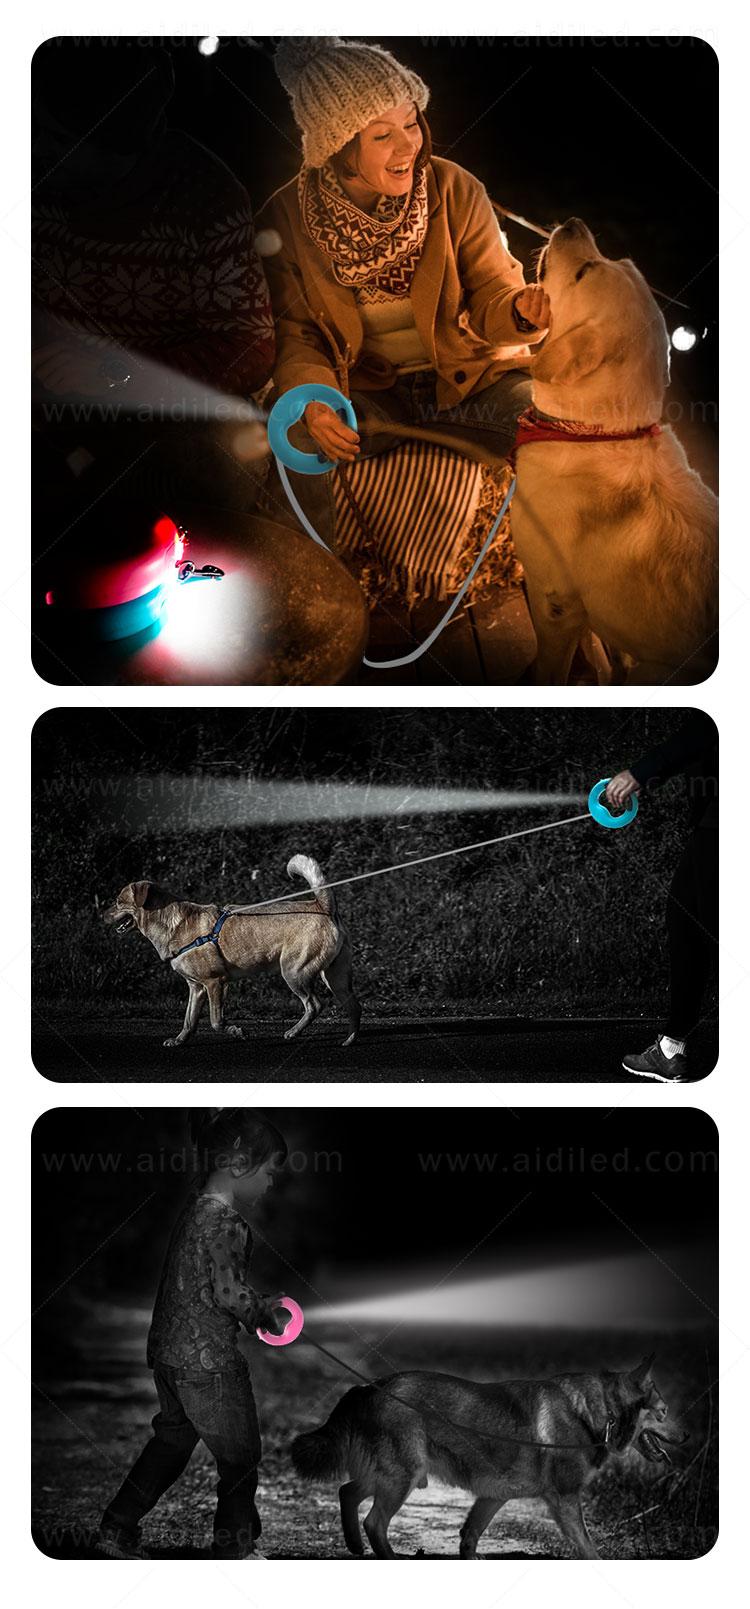 product-AIDI-led dog leash-img-1